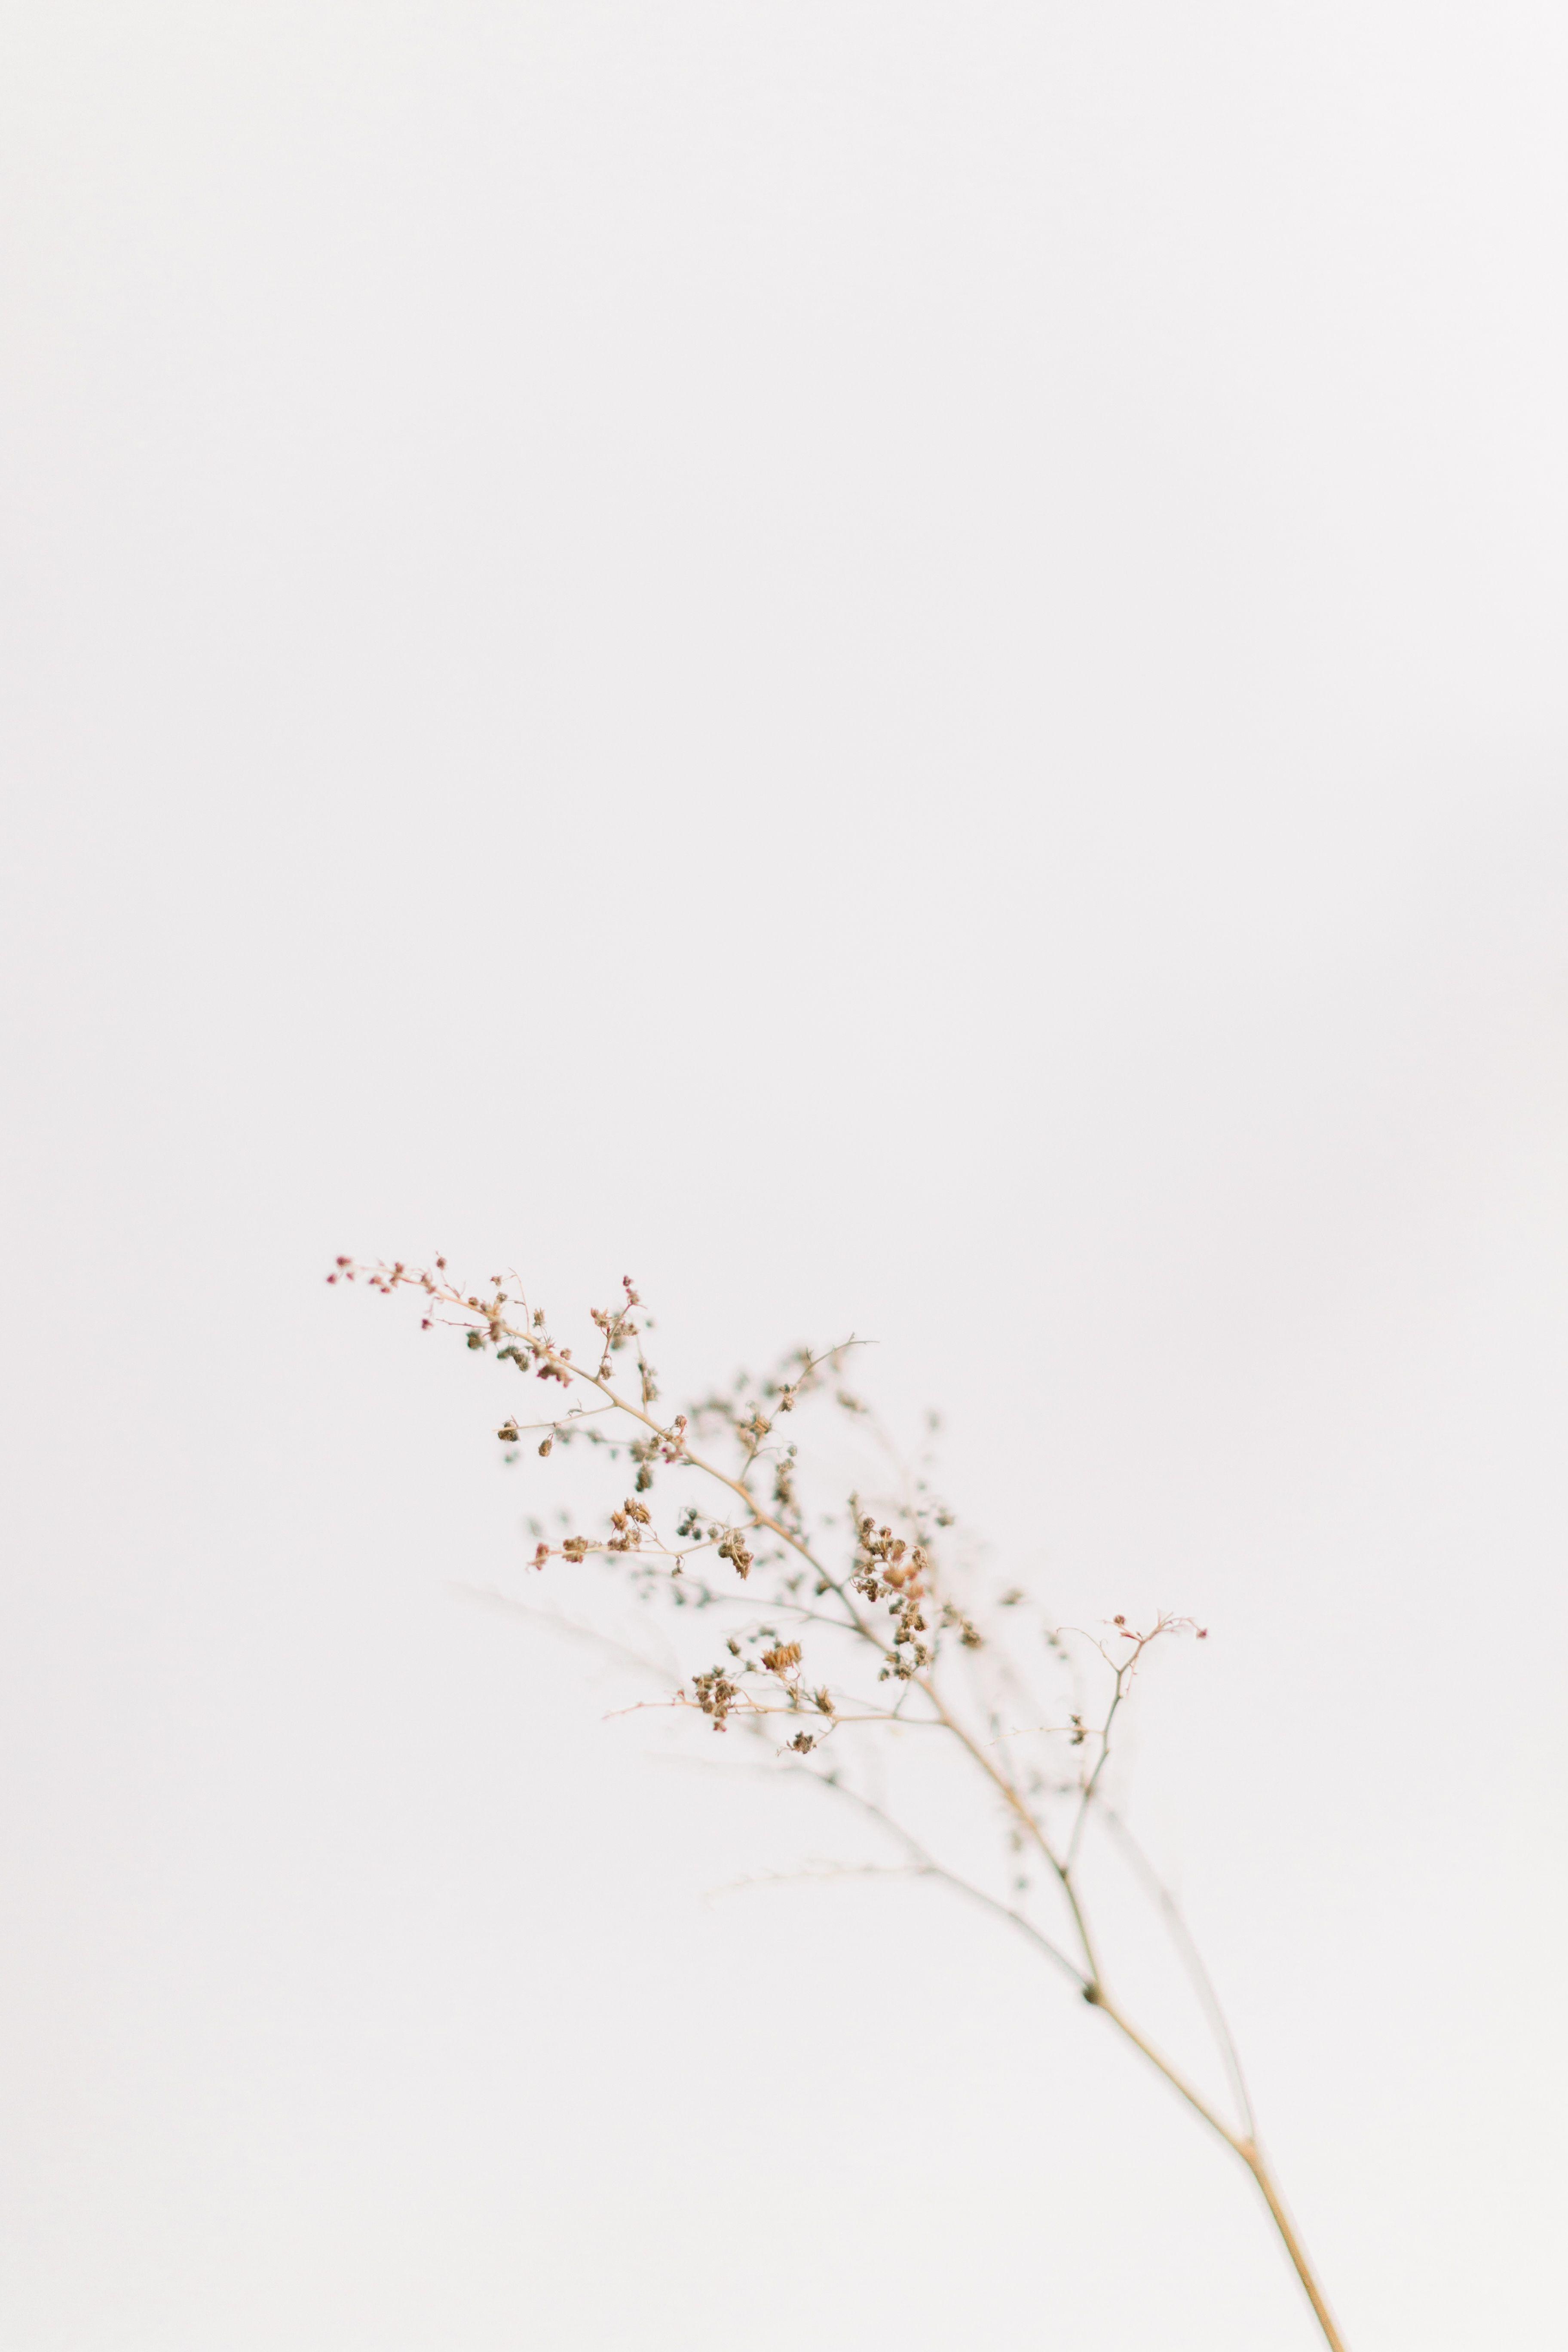 In The Studio Faintfloral Vintage Flowers Wallpaper Dark Wallpaper Iphone Iphone Background Wallpaper